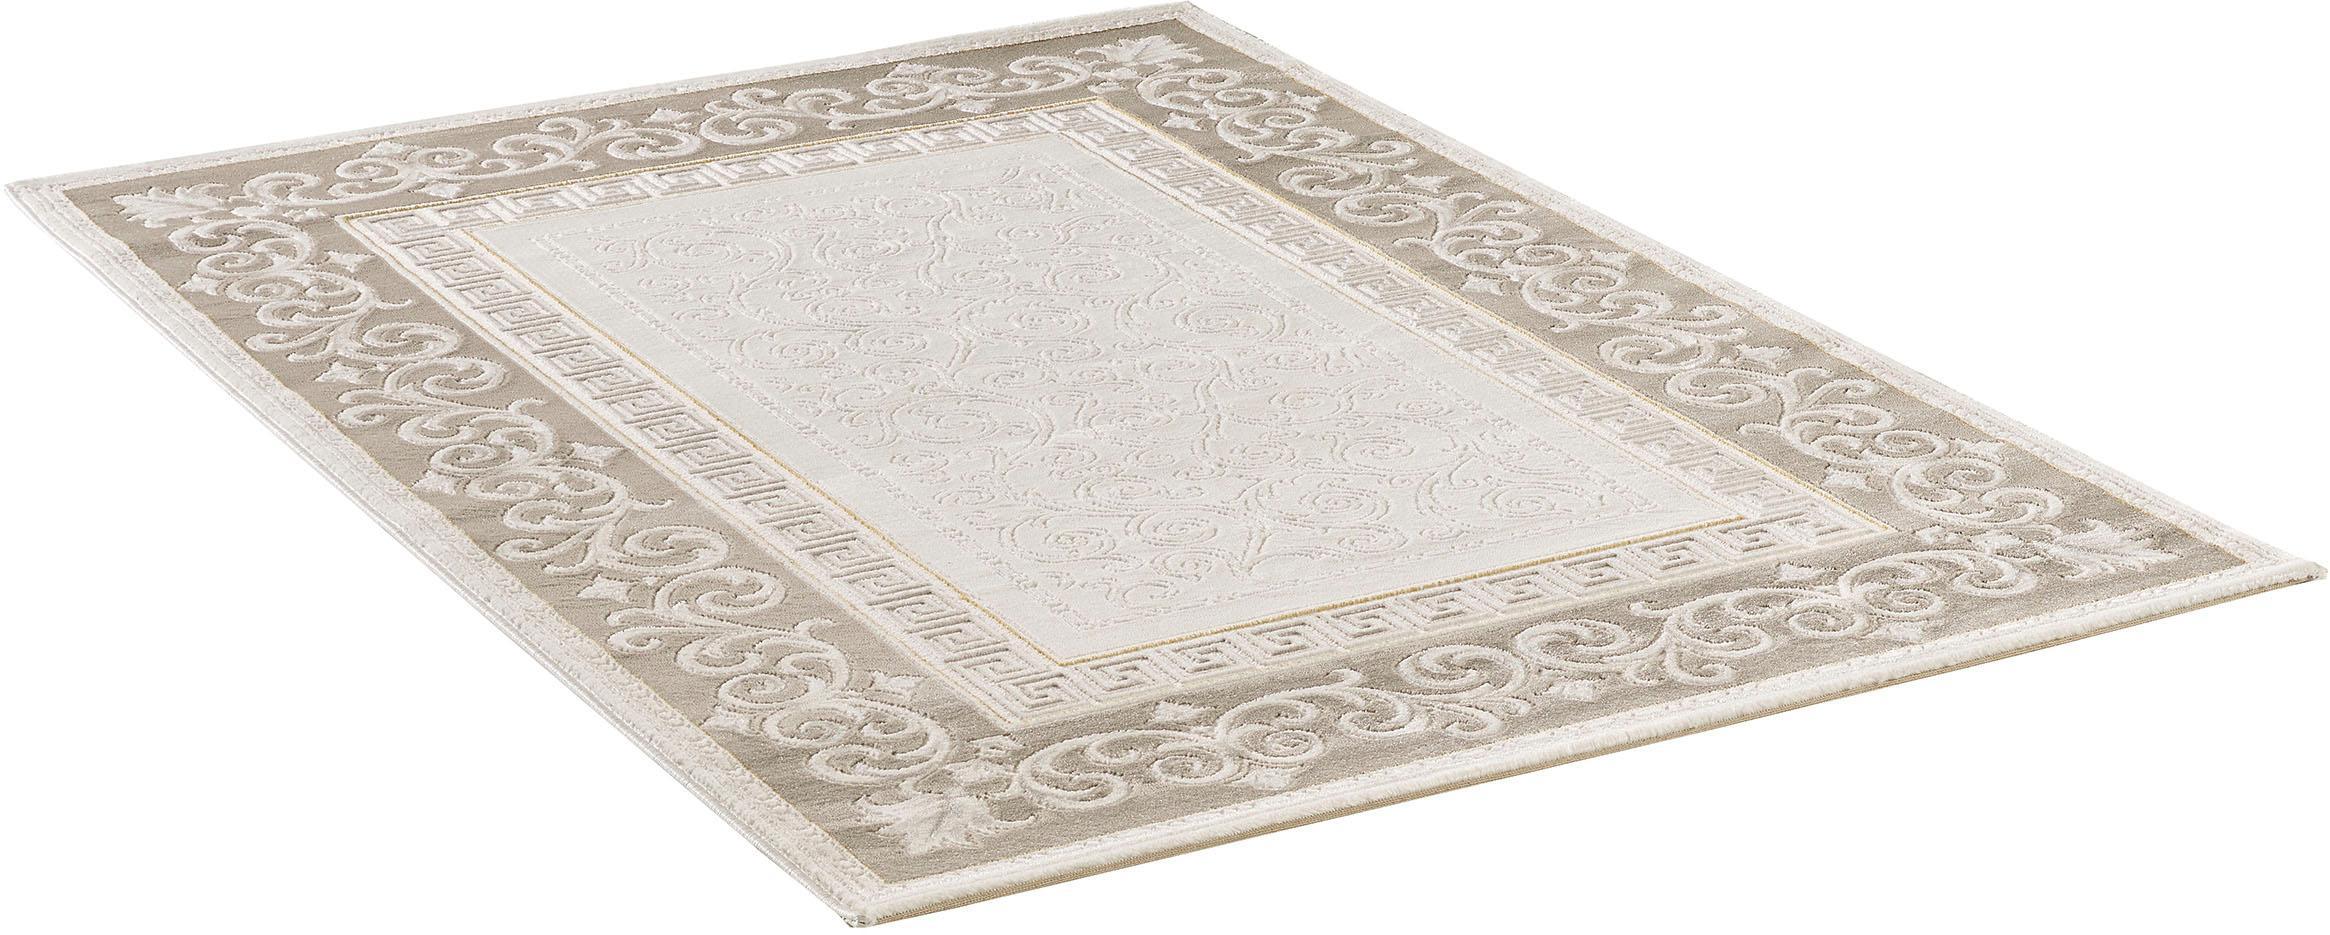 Teppich Harmony 3206 Sanat Teppiche rechteckig Höhe 12 mm maschinell gewebt